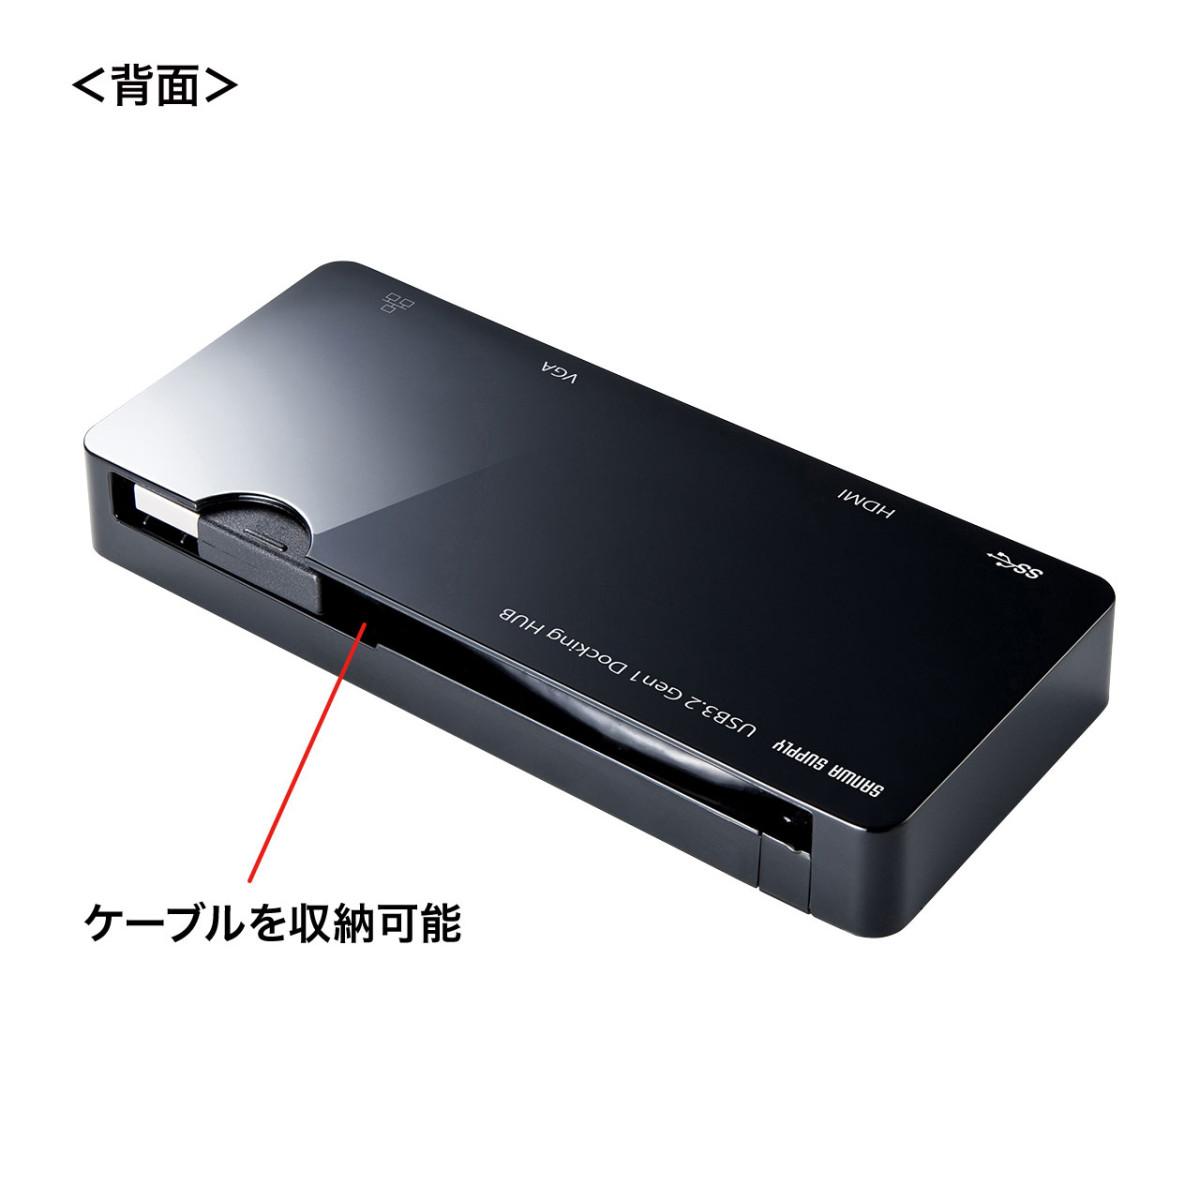 [USB-3H131BK] USB3.2 Gen1モバイル ドッキングステーション